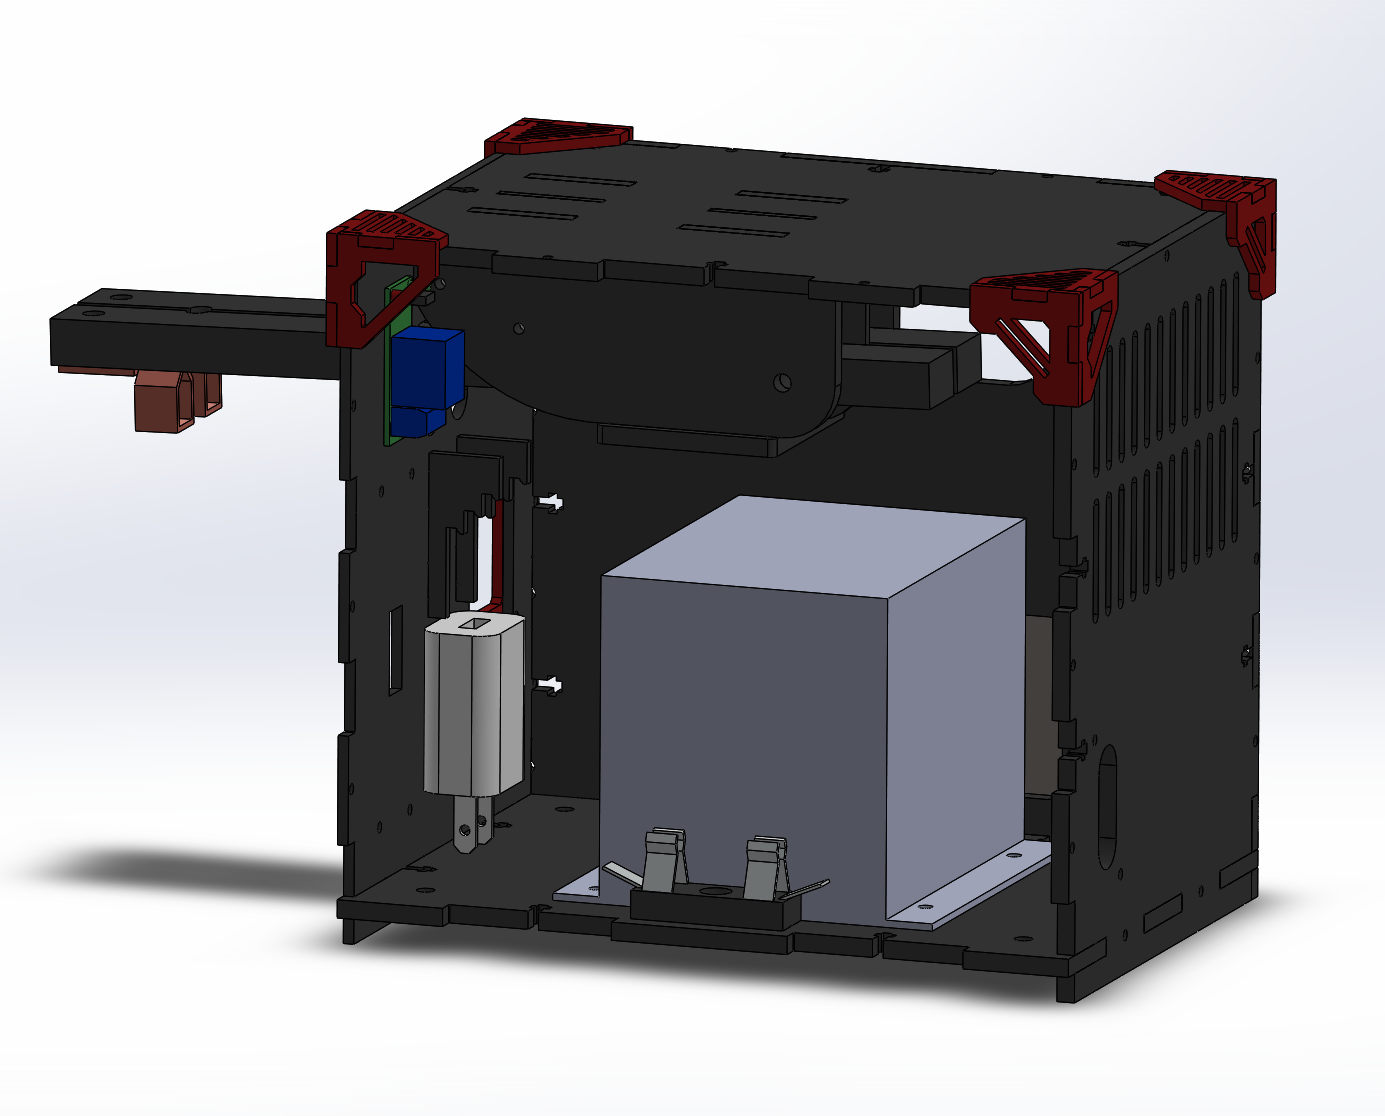 DIY Spot Welder for Creating Battery Packs | Hackaday io